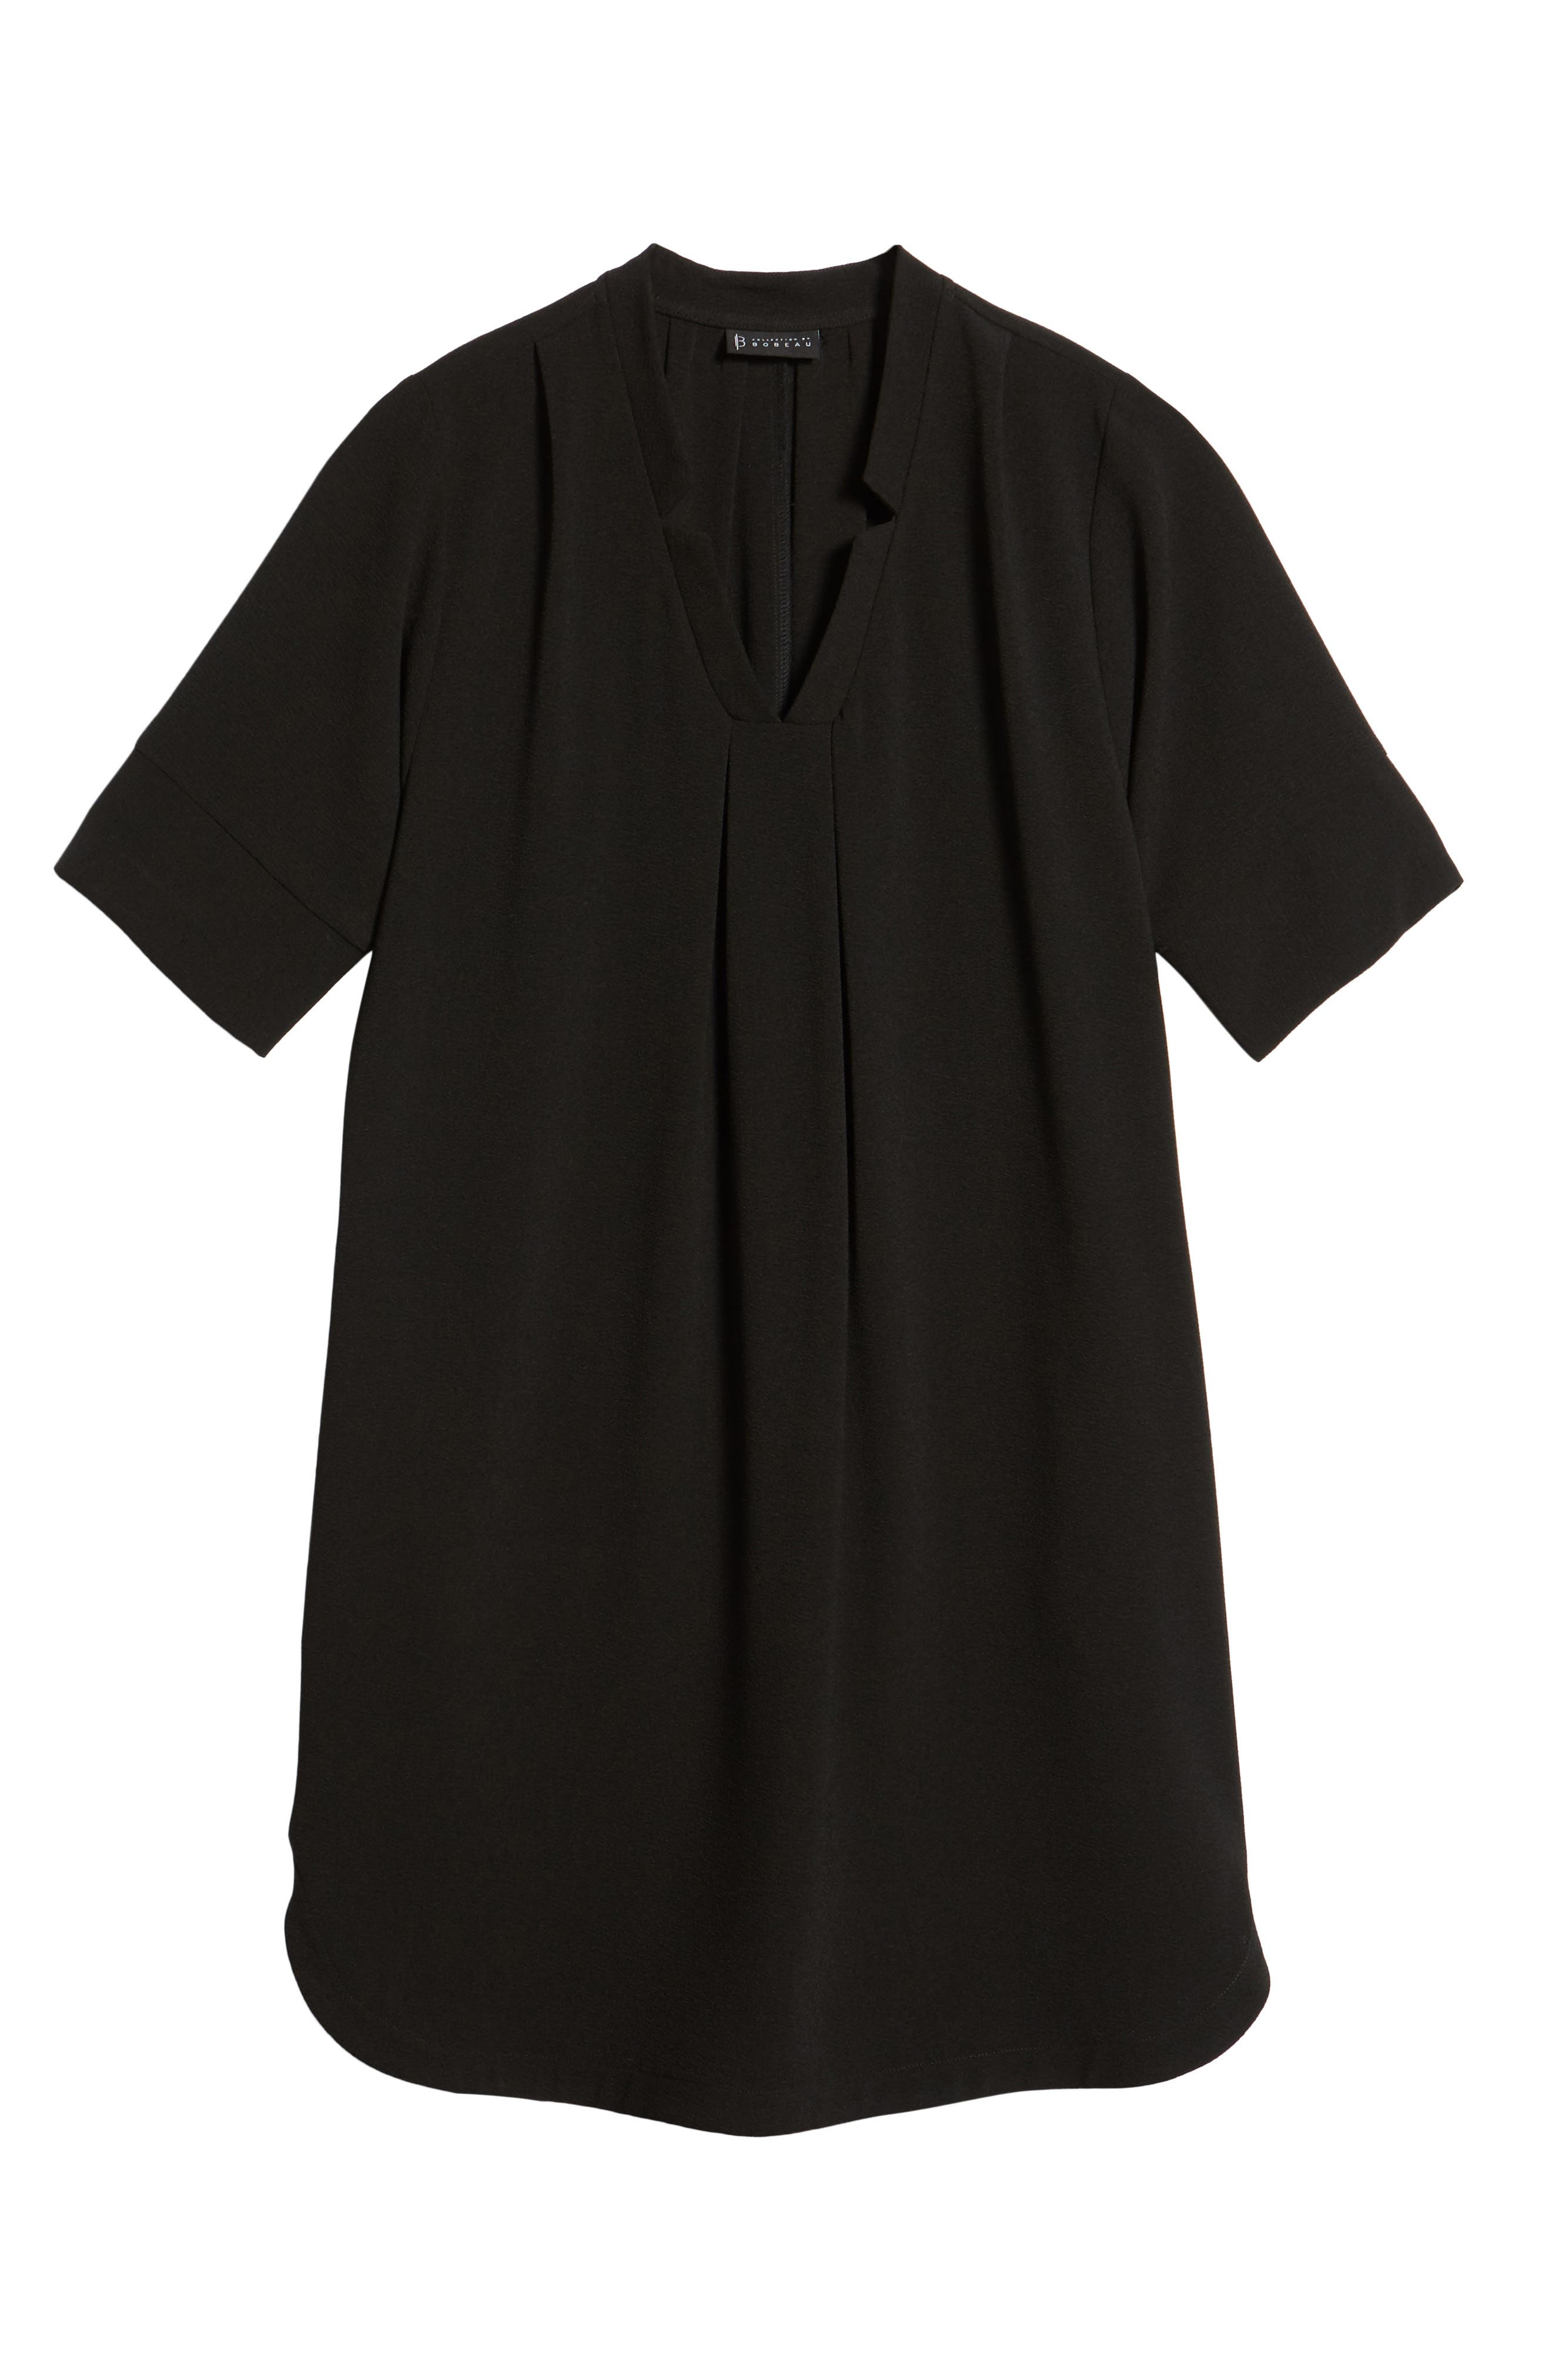 BOBEAU, Pleat Front Curved Hem Shirtdress, Alternate thumbnail 7, color, BLACK